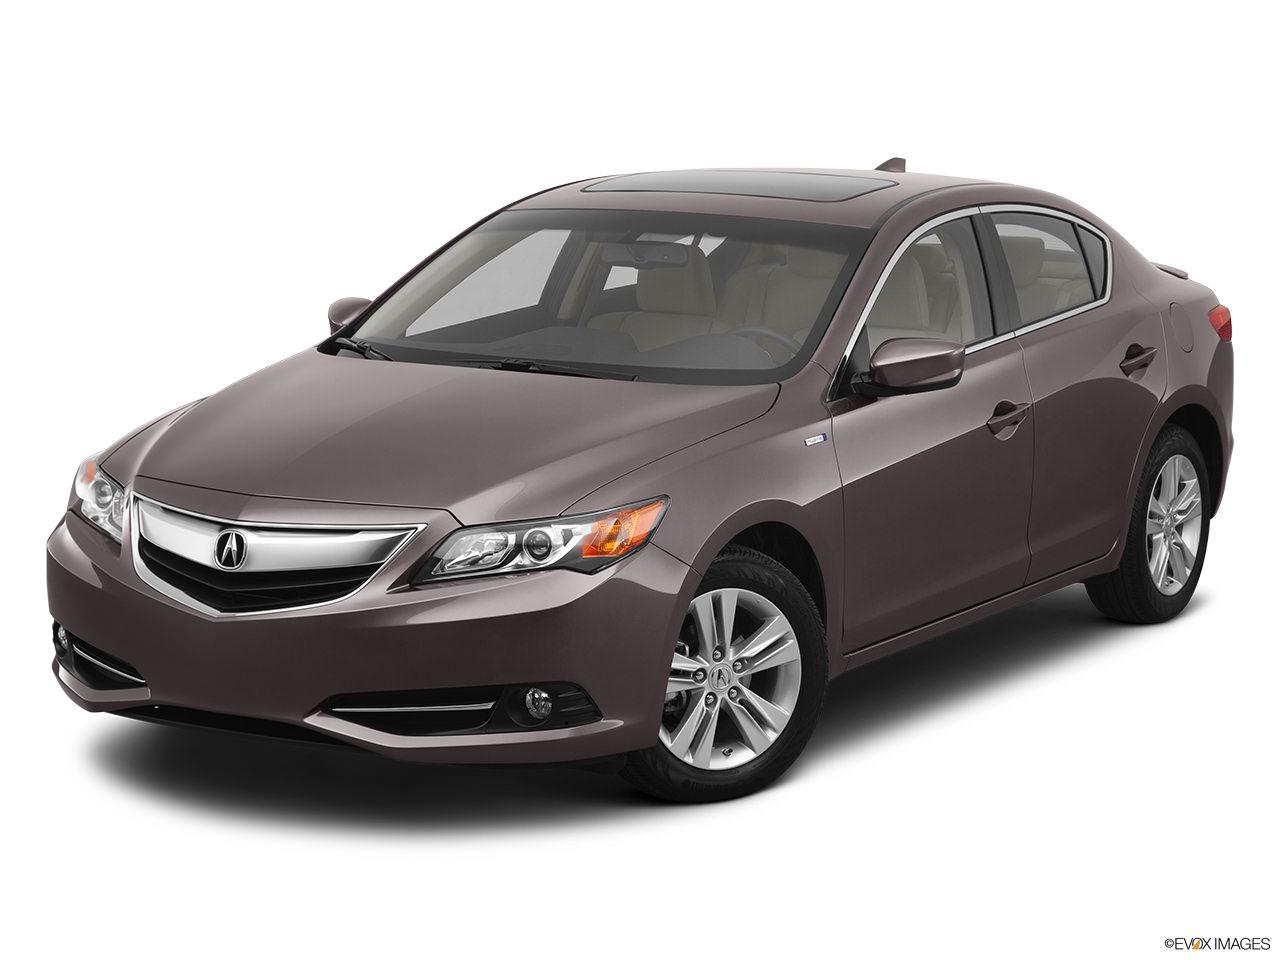 Acura ILX Hybrid 2013